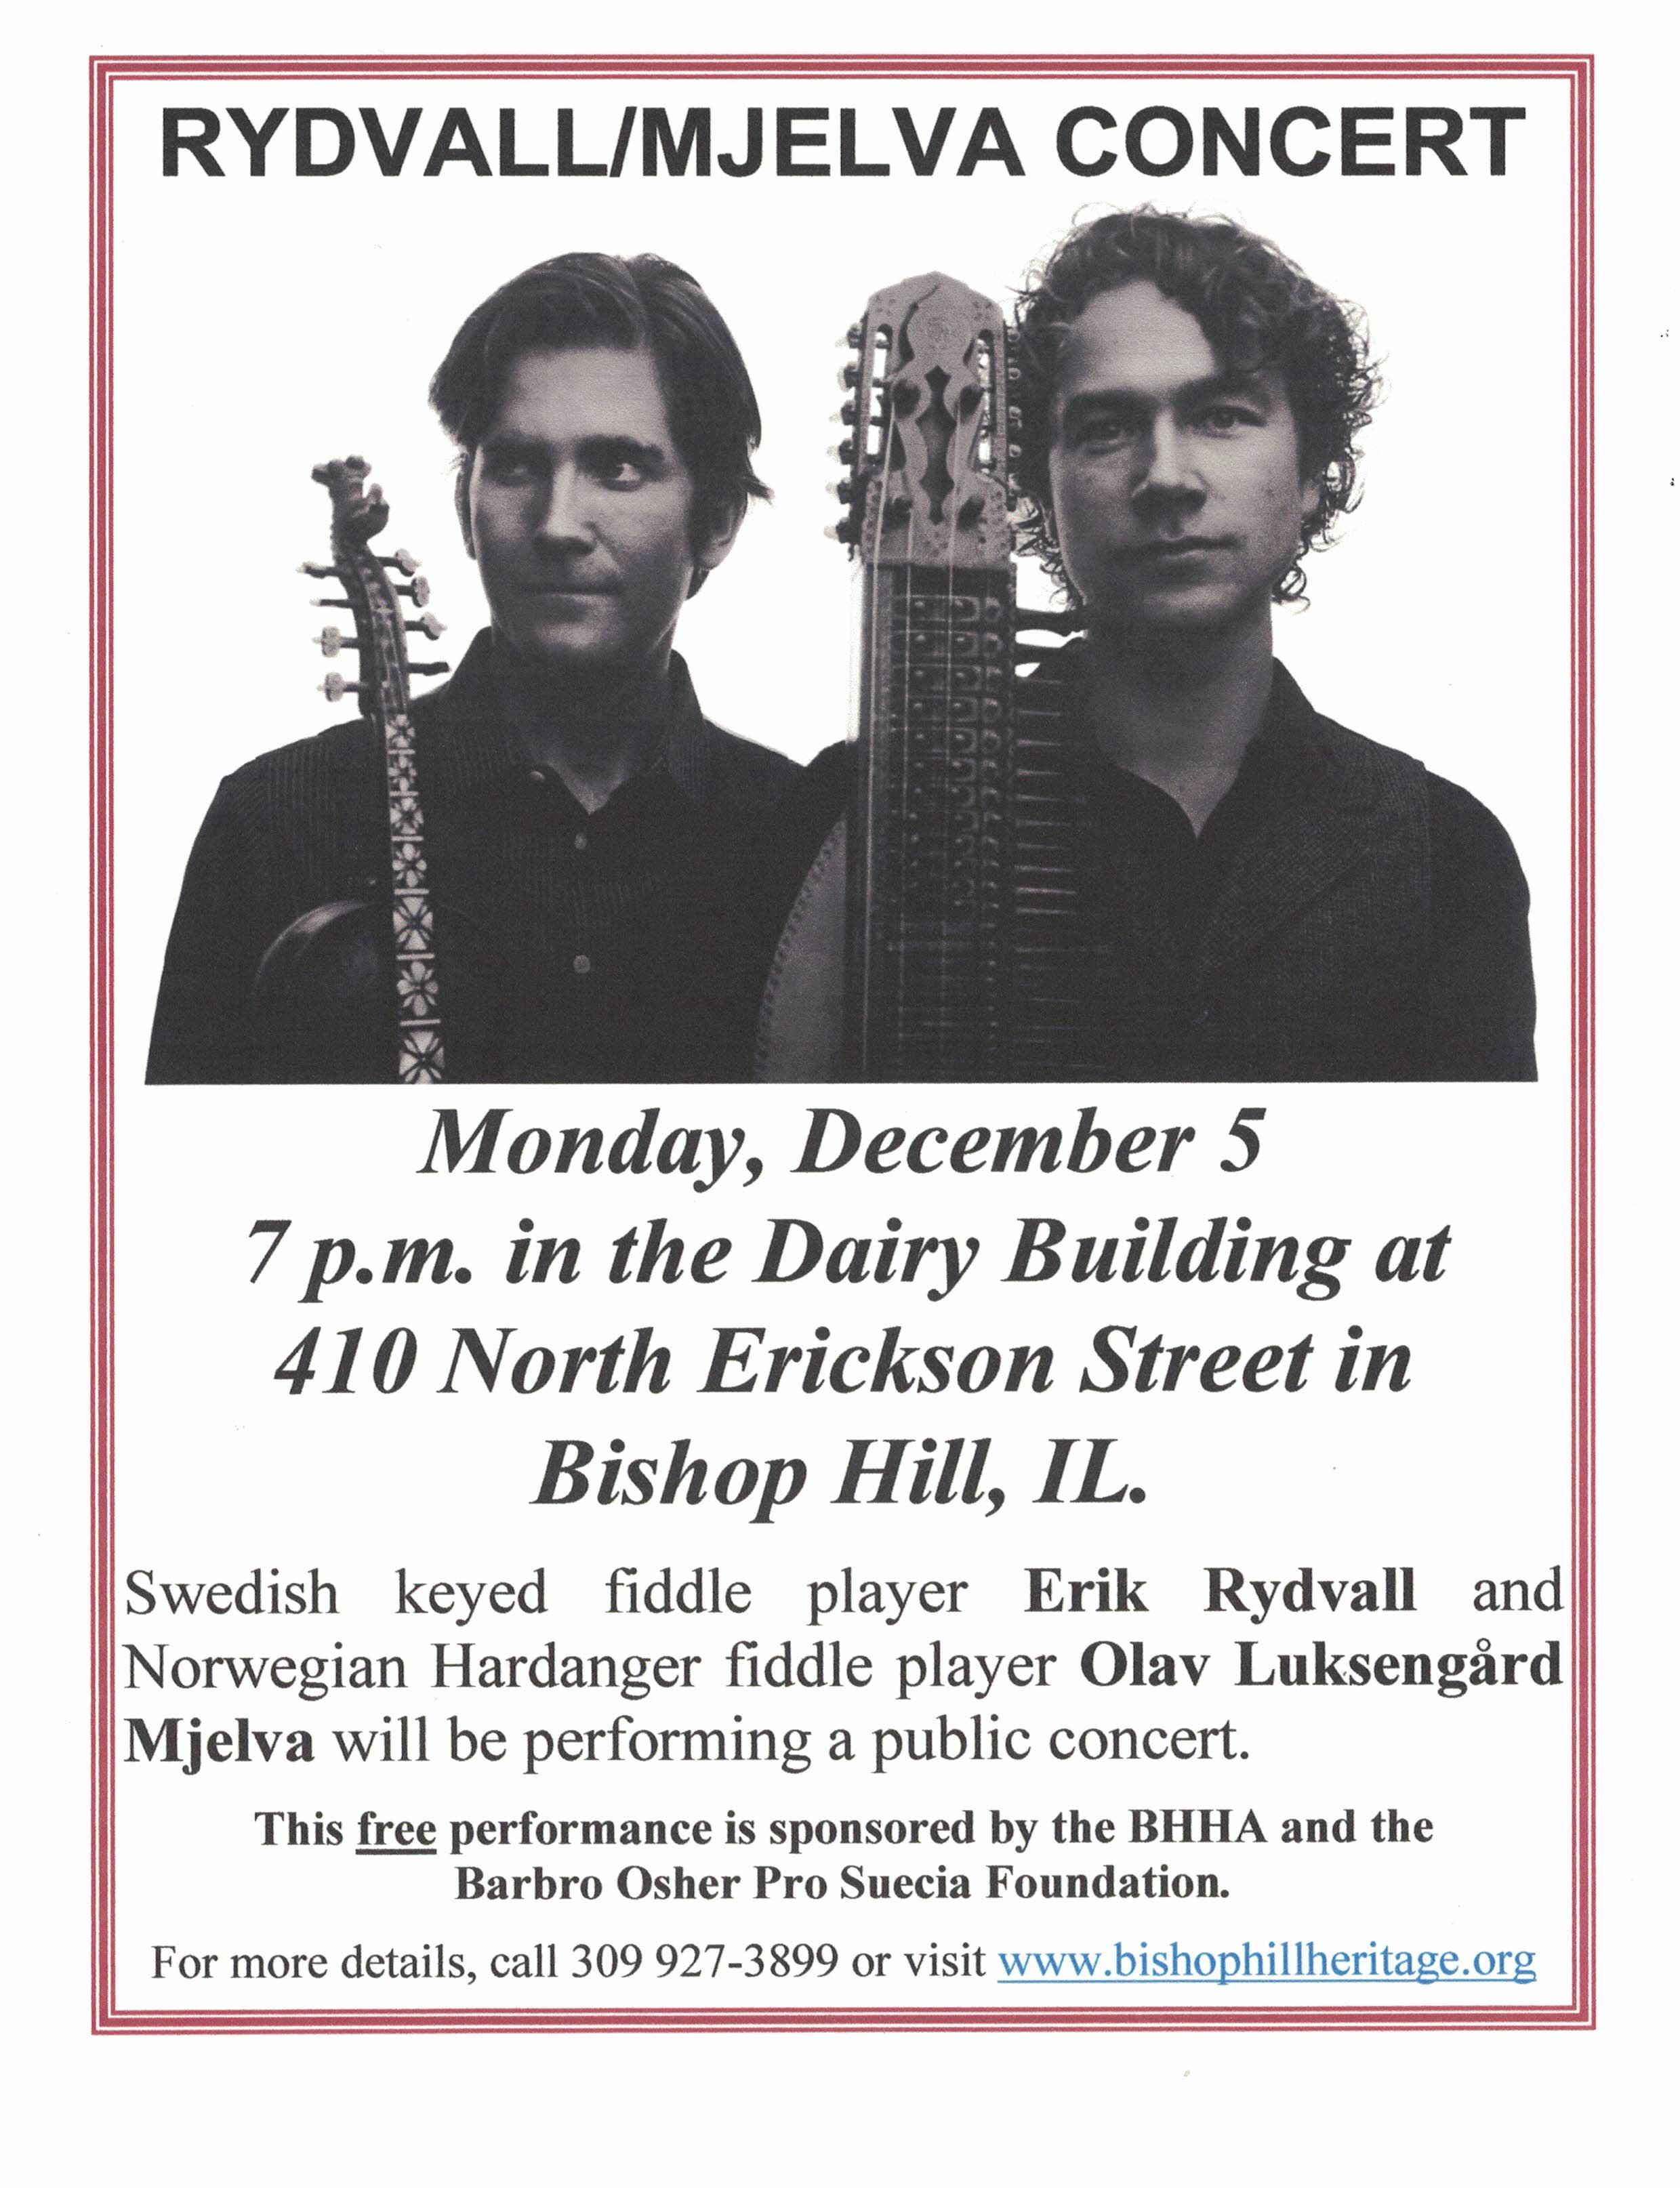 rydvall-and-mjelva-concert-poster